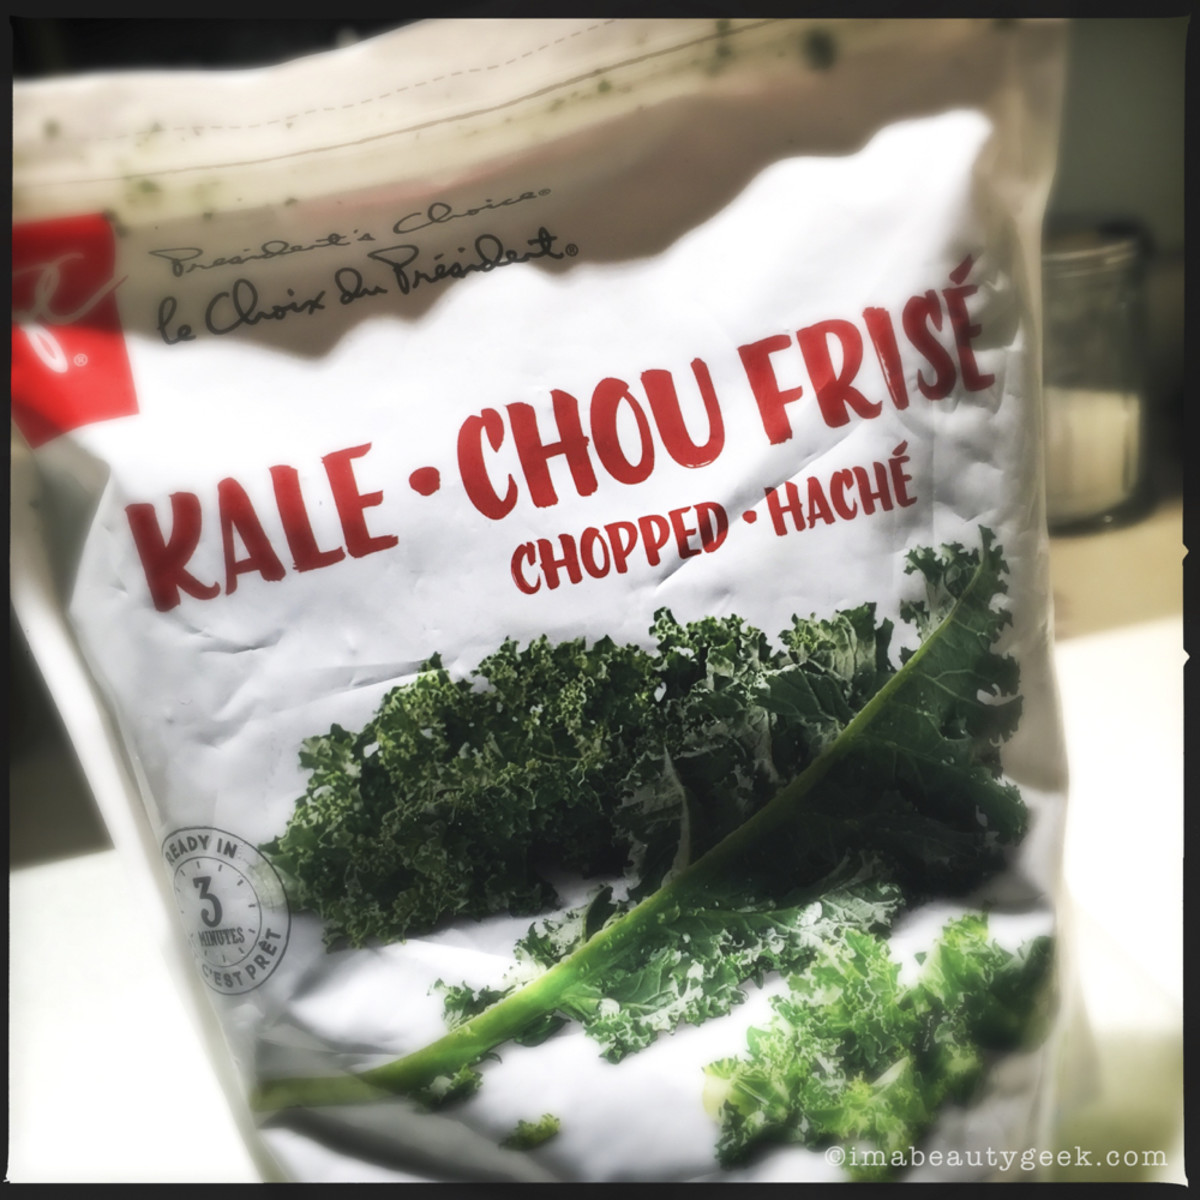 President's Choice Chopped Kale